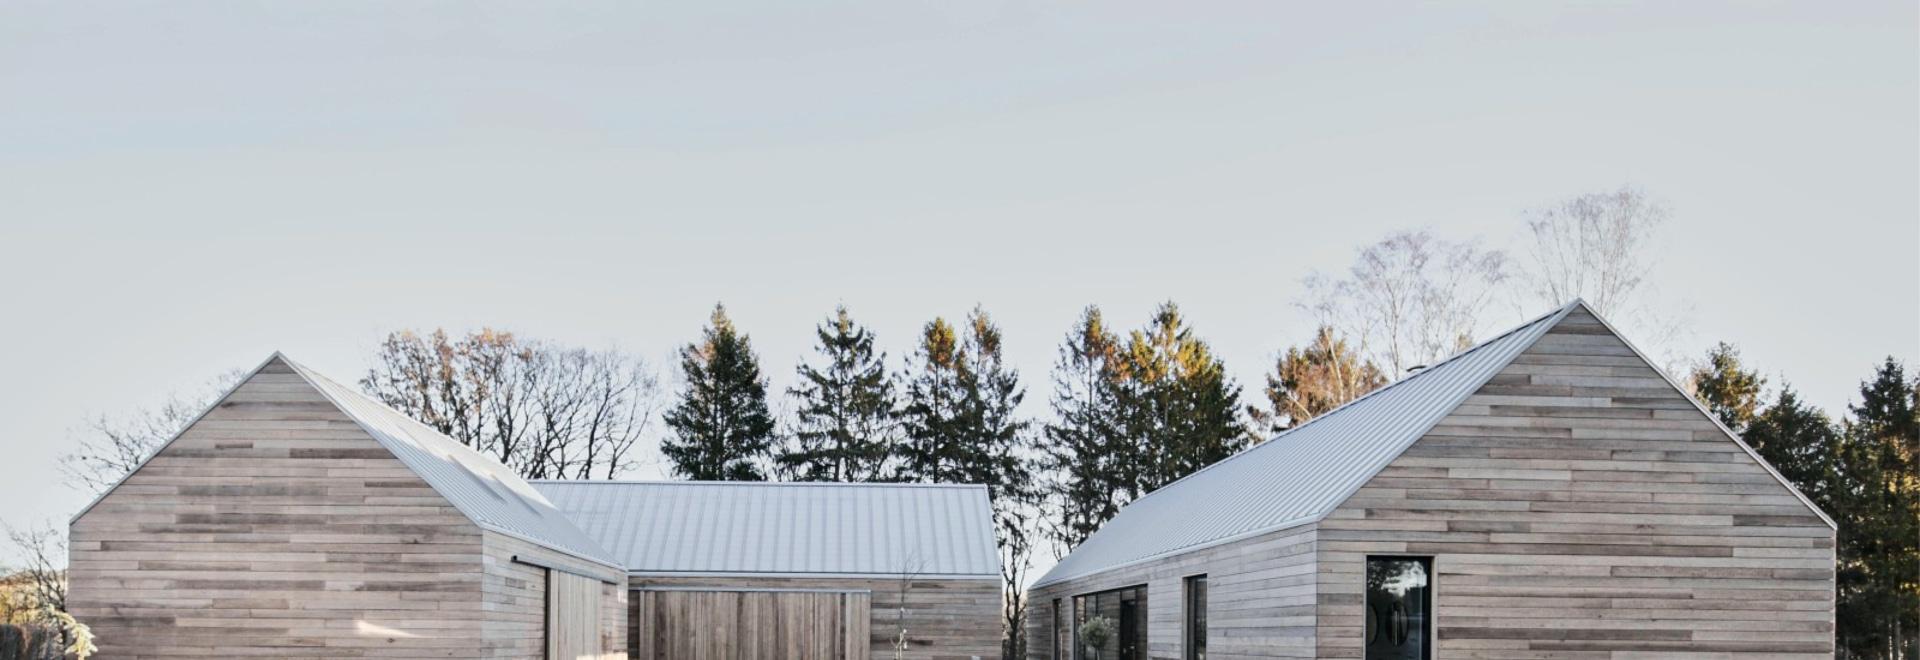 Casa Ry by Christoffersen Weiling Architect